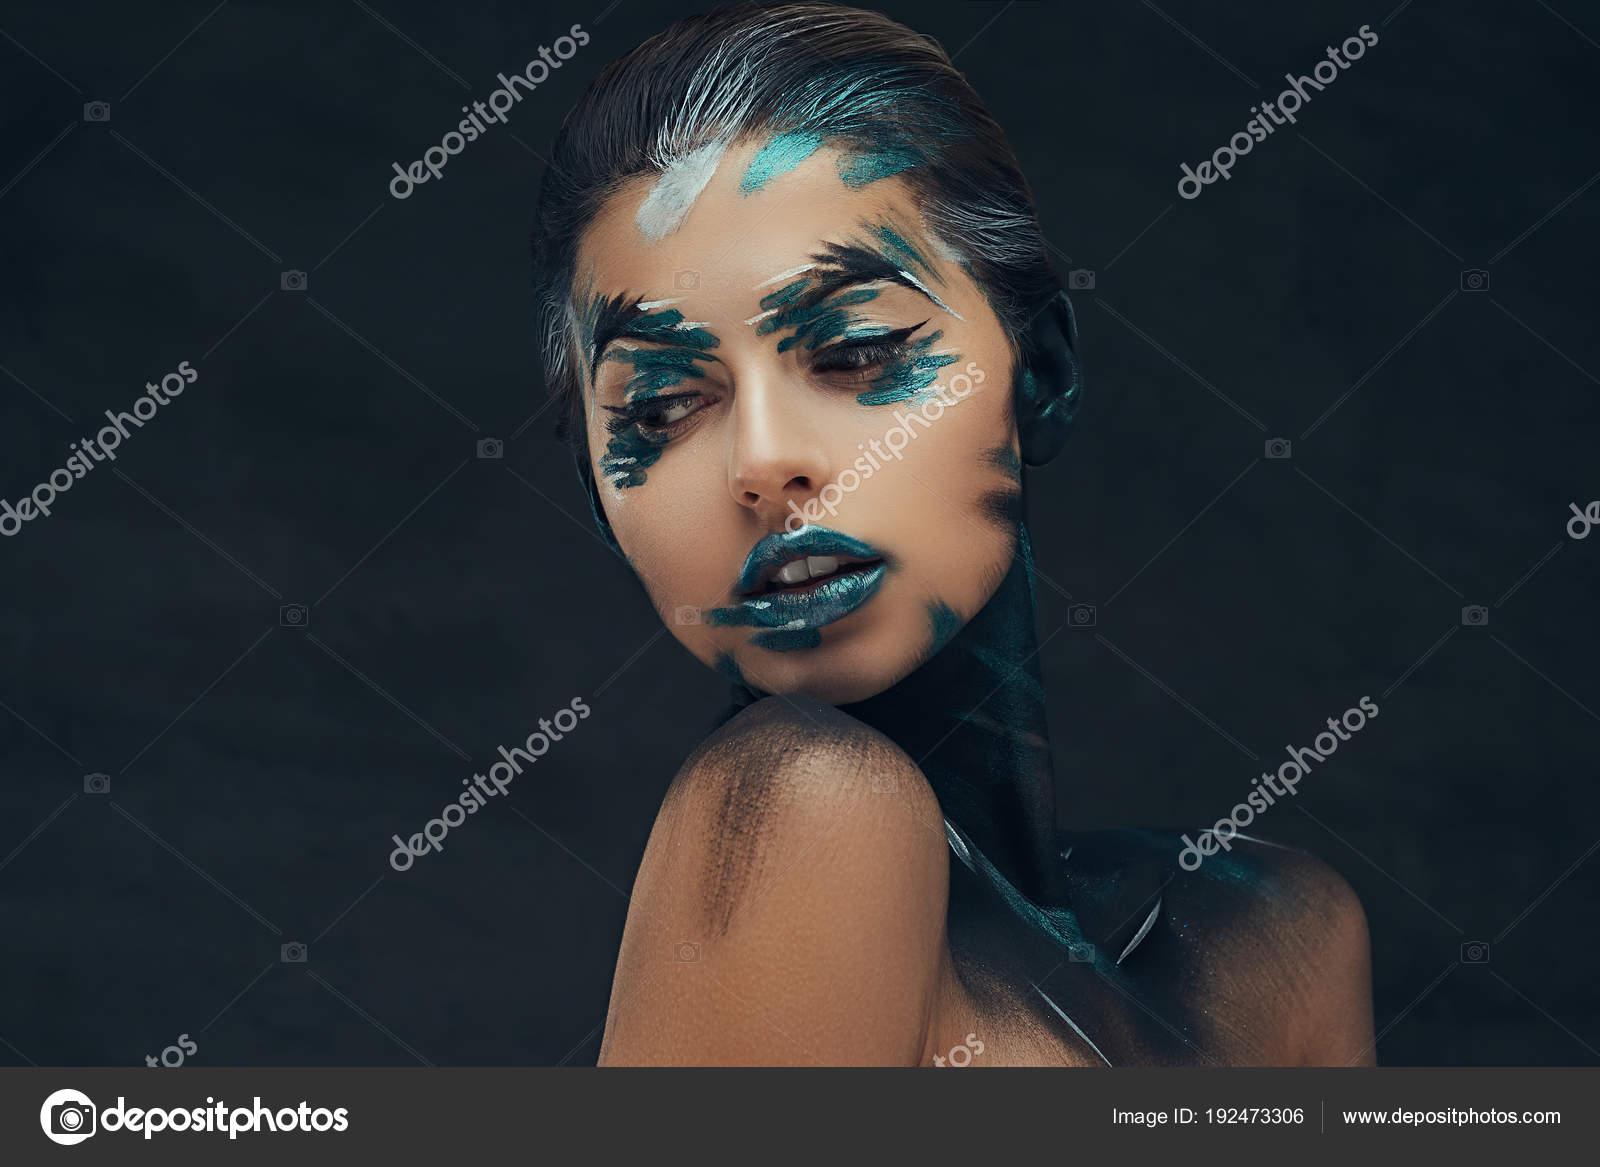 Пизда и лицо девушки на одном фото Частное фото 788